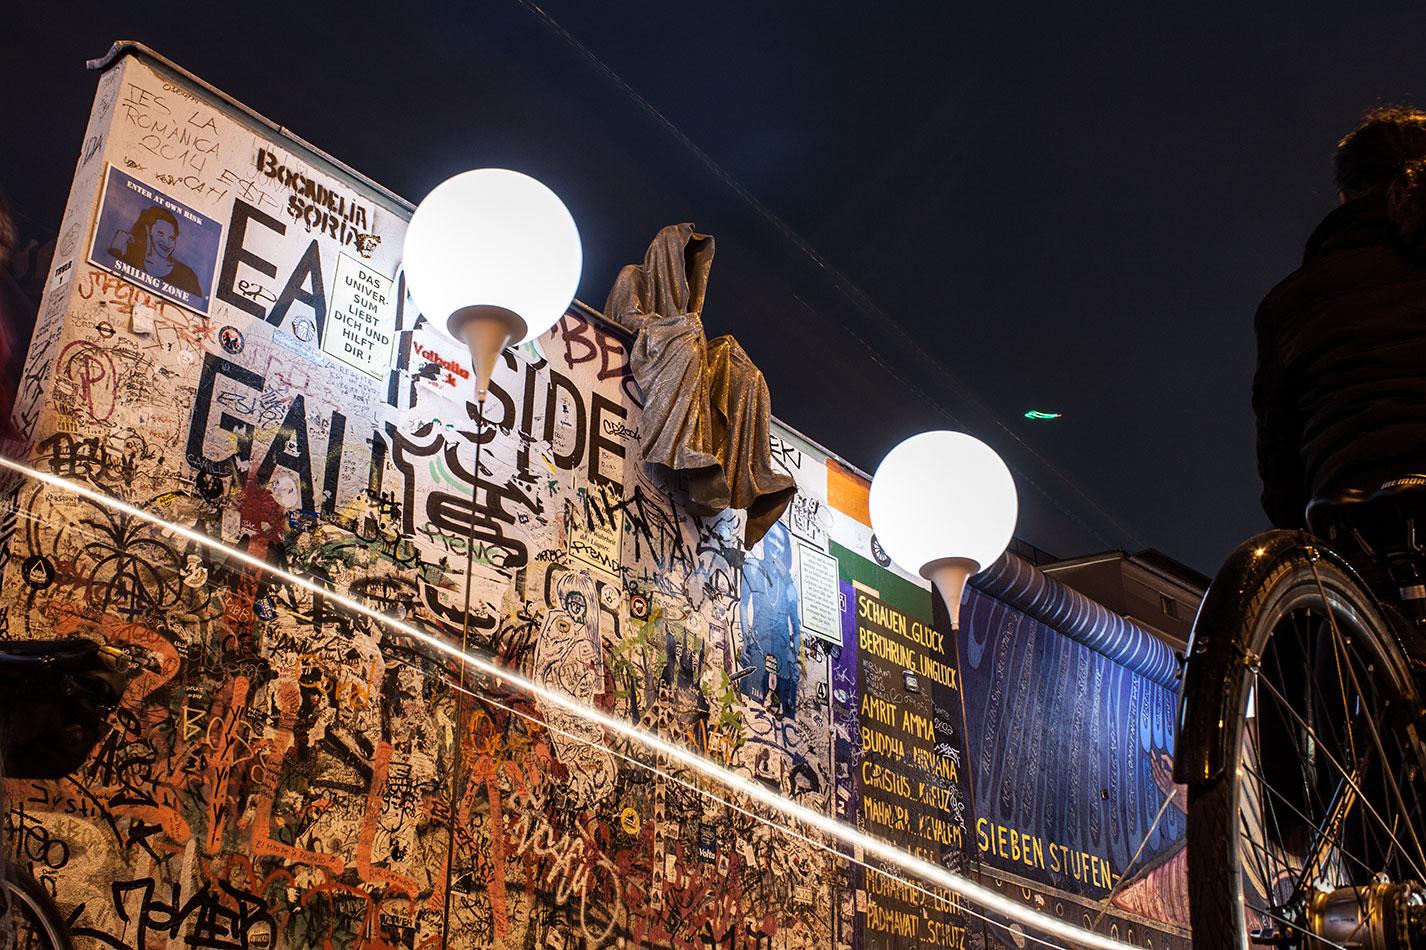 25-jears-wallfall-berlin-germany-contemporary-fine-art-show-arts-design-guardians-of-time-manfred-kili-kielnhofer-4279